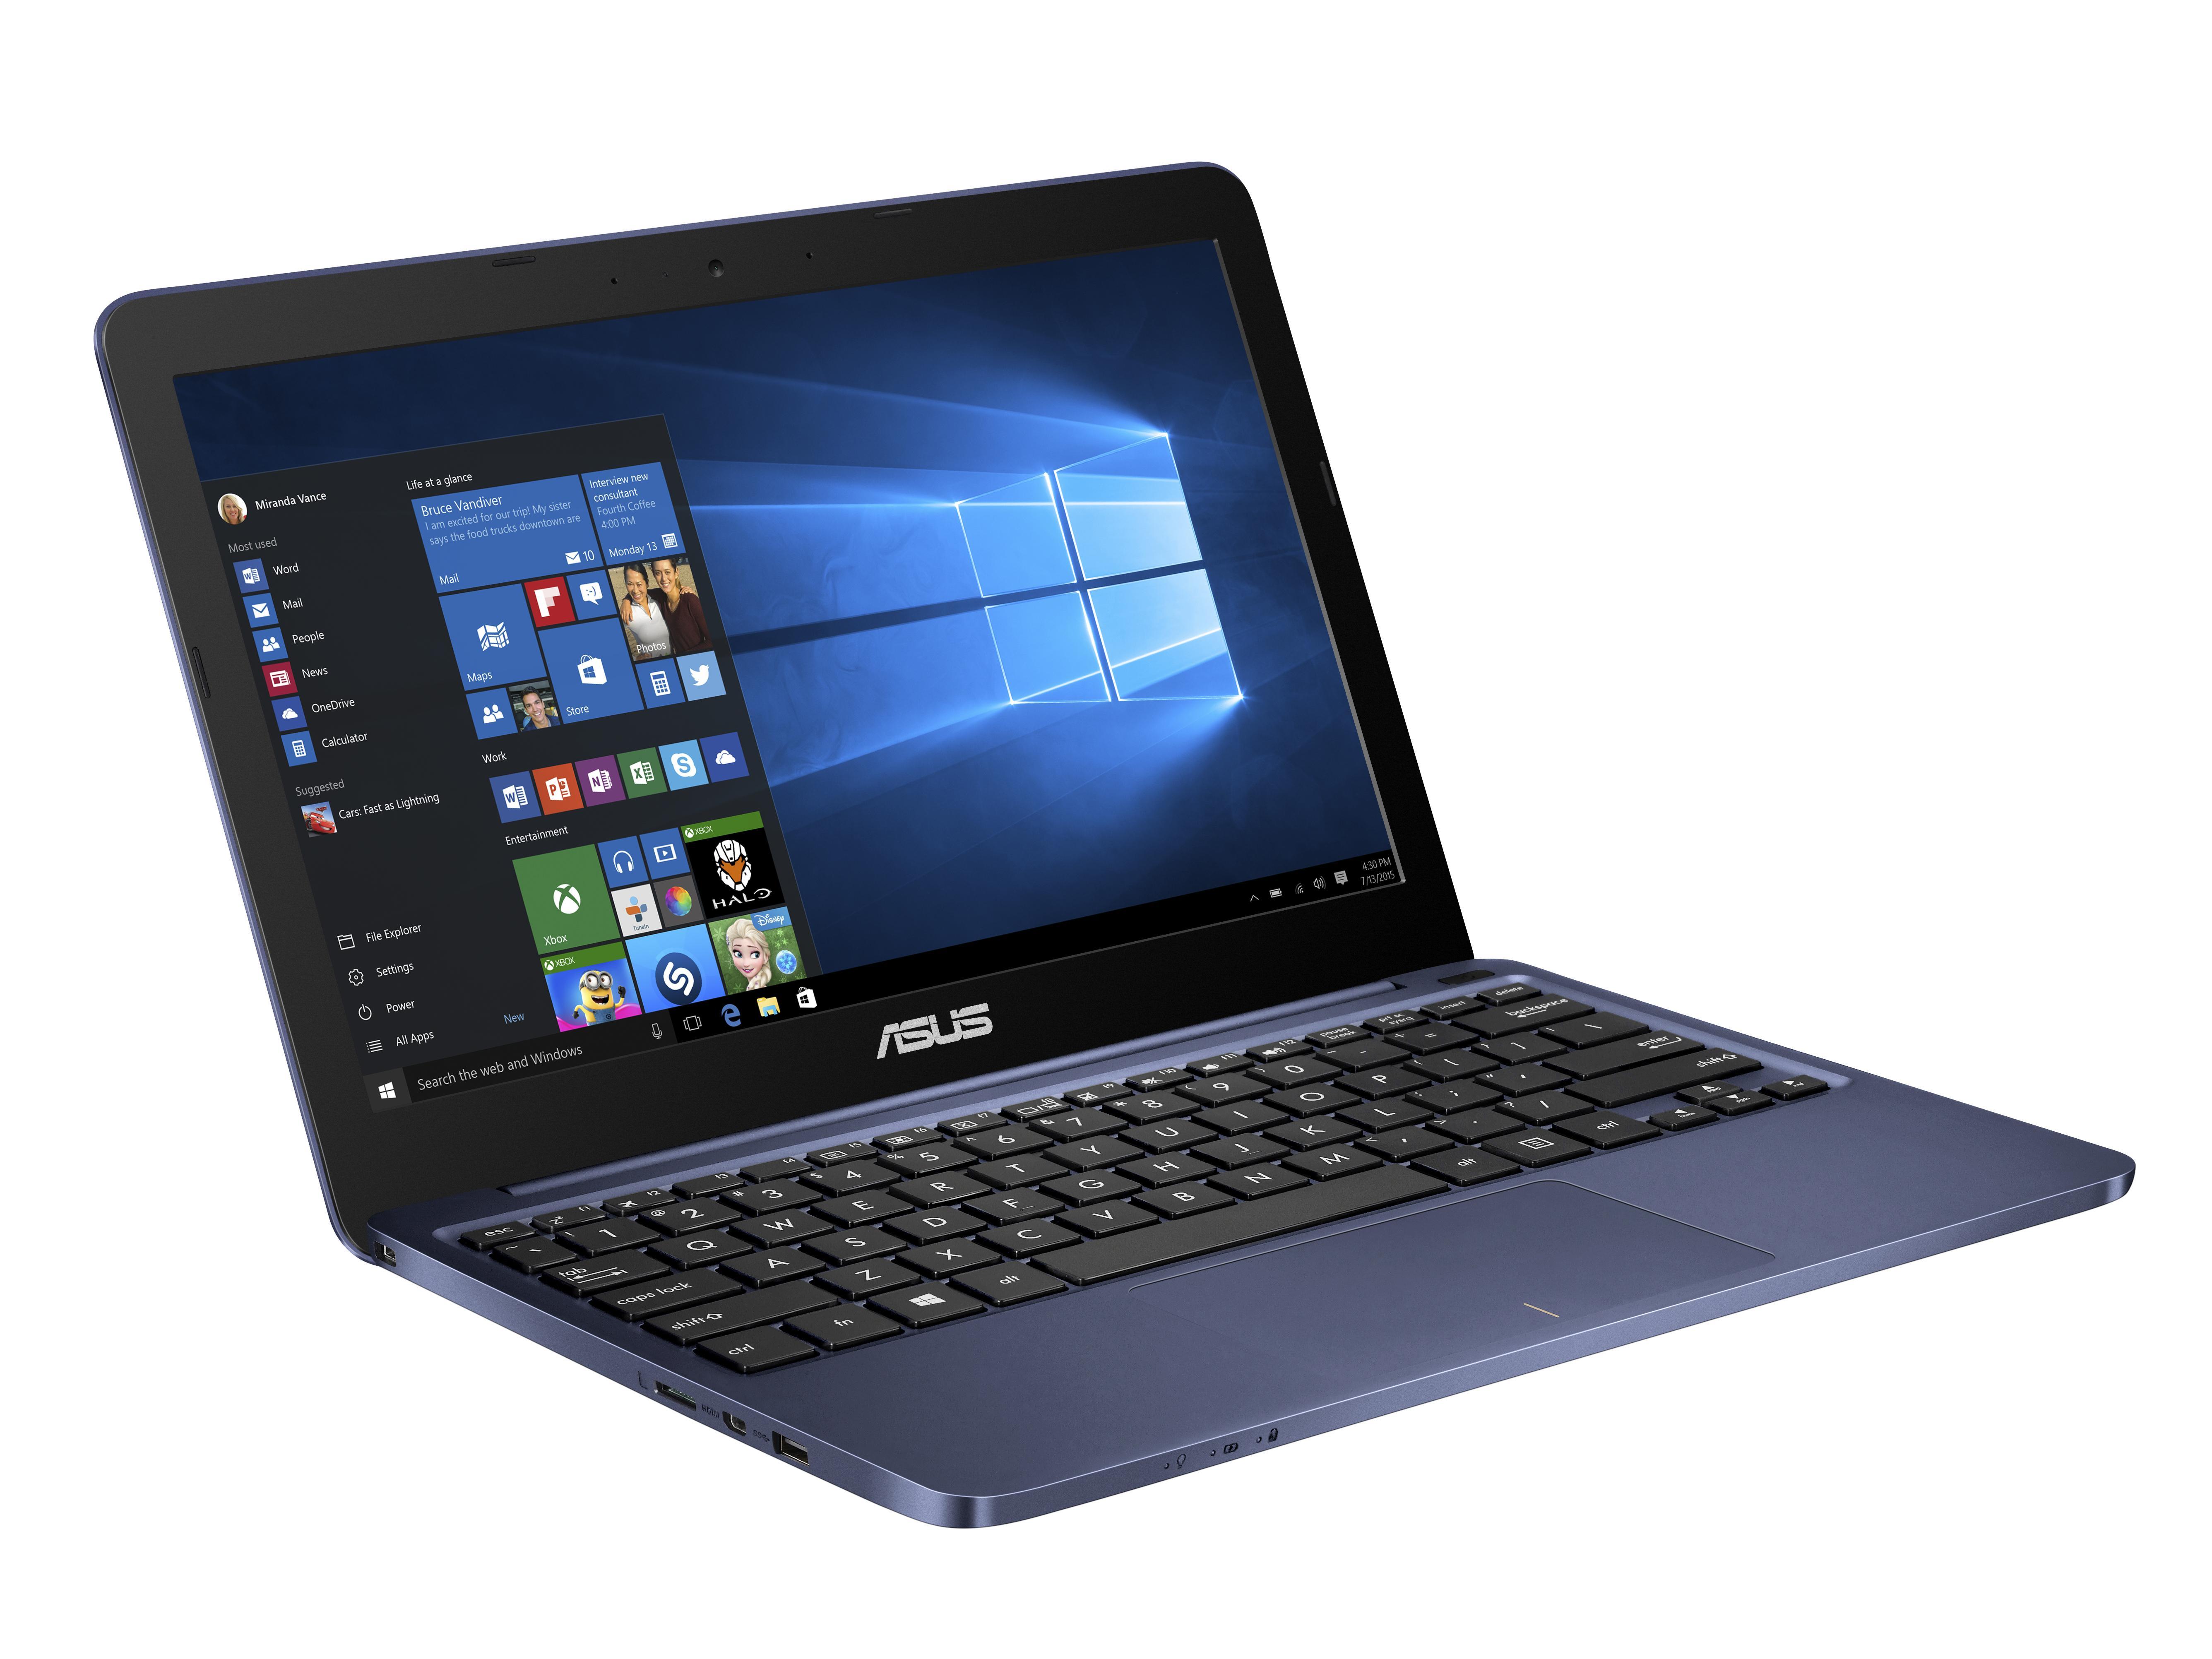 ASUS E200HA 11,6/x5-Z8300/32GB/2G/Win10, modrý